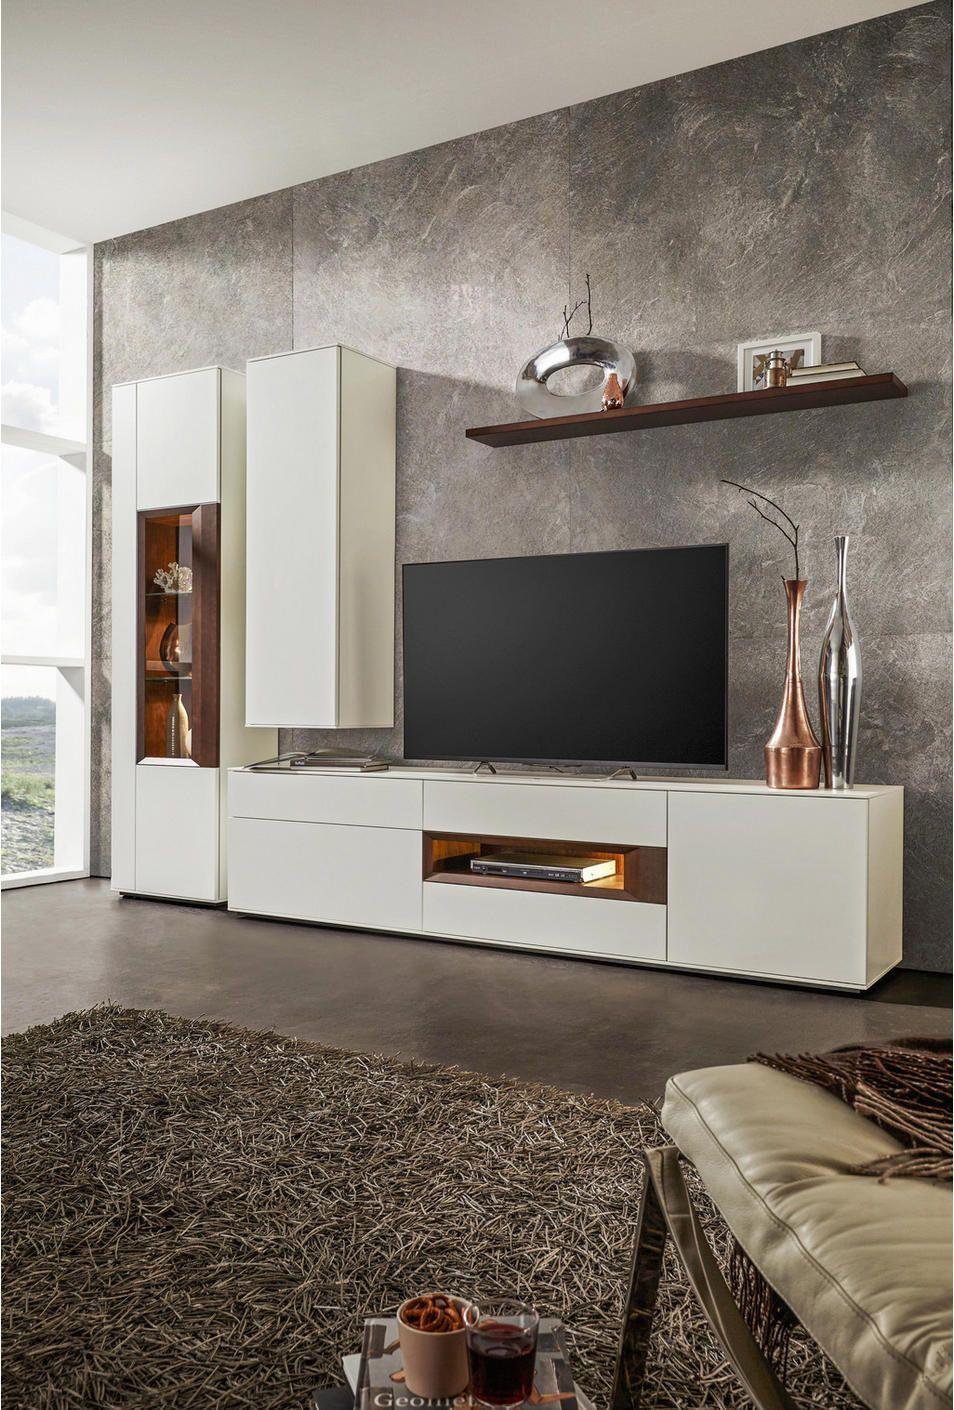 Wohnwand In Weiss Nussbaumfarben Tv Wall Decor Living Room